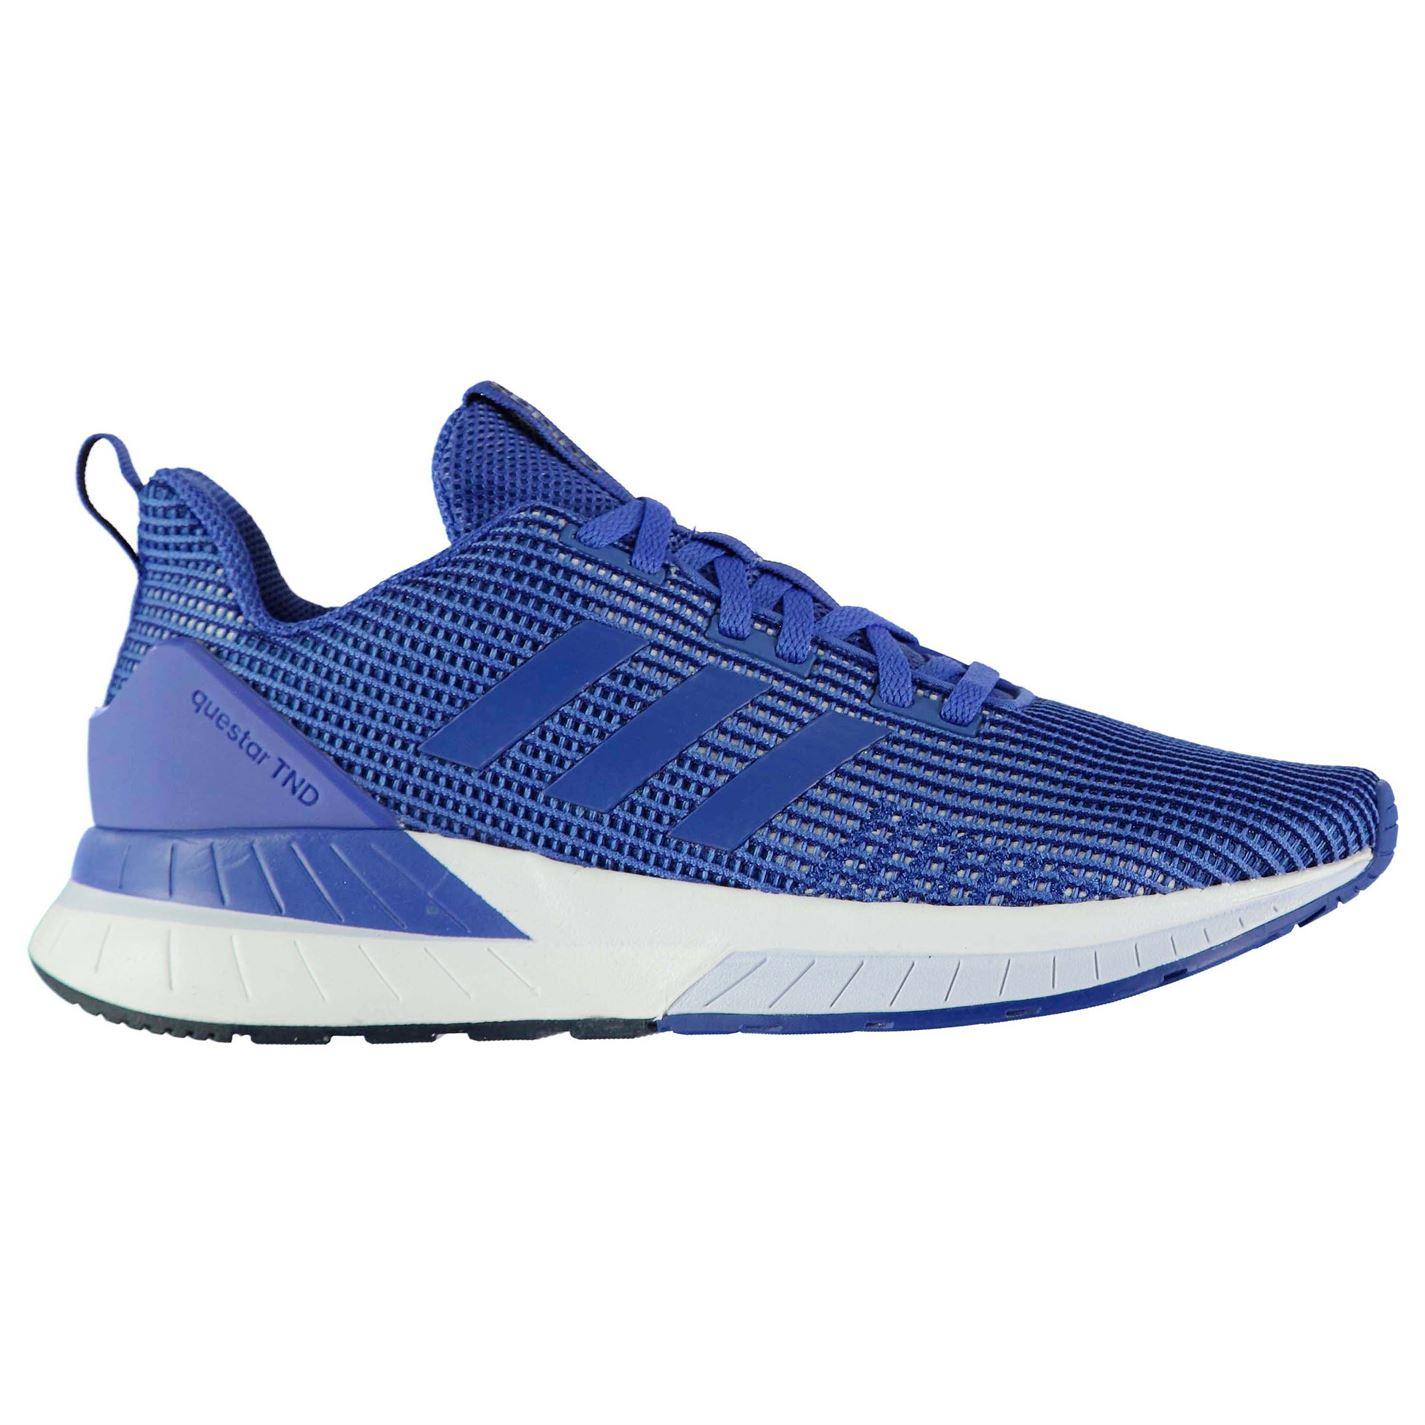 adidas Questar TND dámské běžecké boty Blue Blue - Glami.cz 679b9c6345